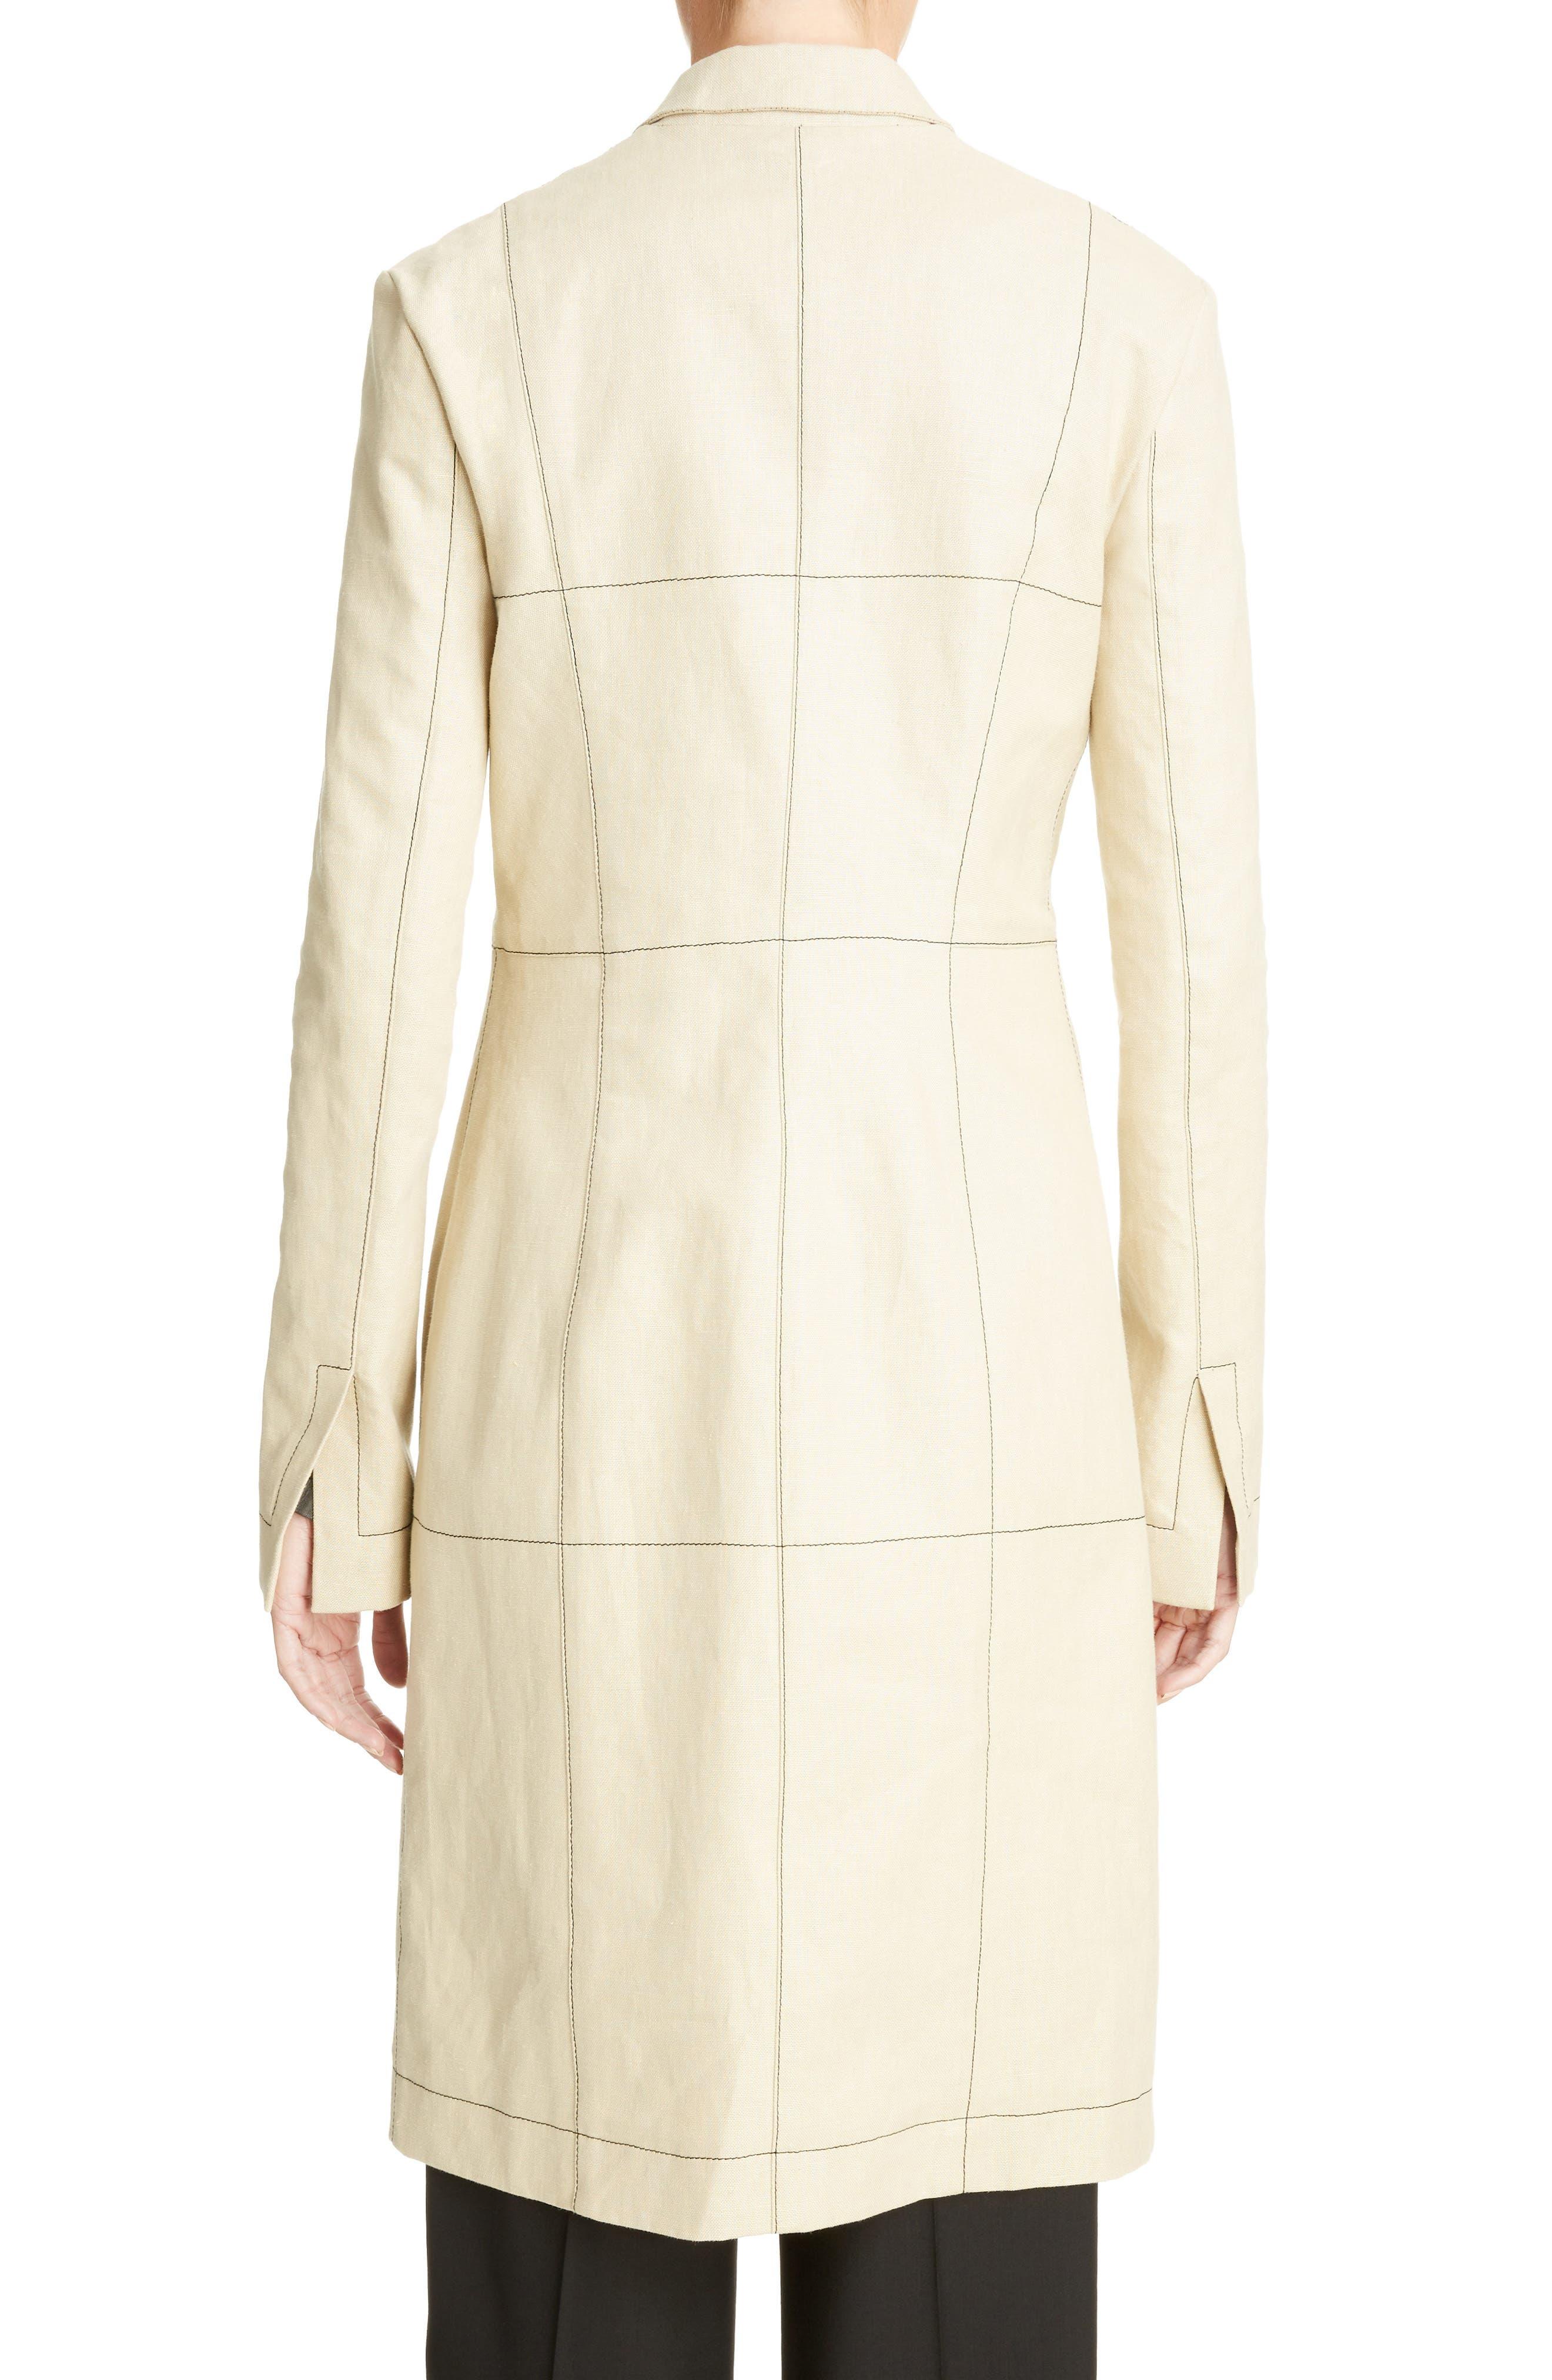 Topstitched Linen Coat,                             Alternate thumbnail 2, color,                             273